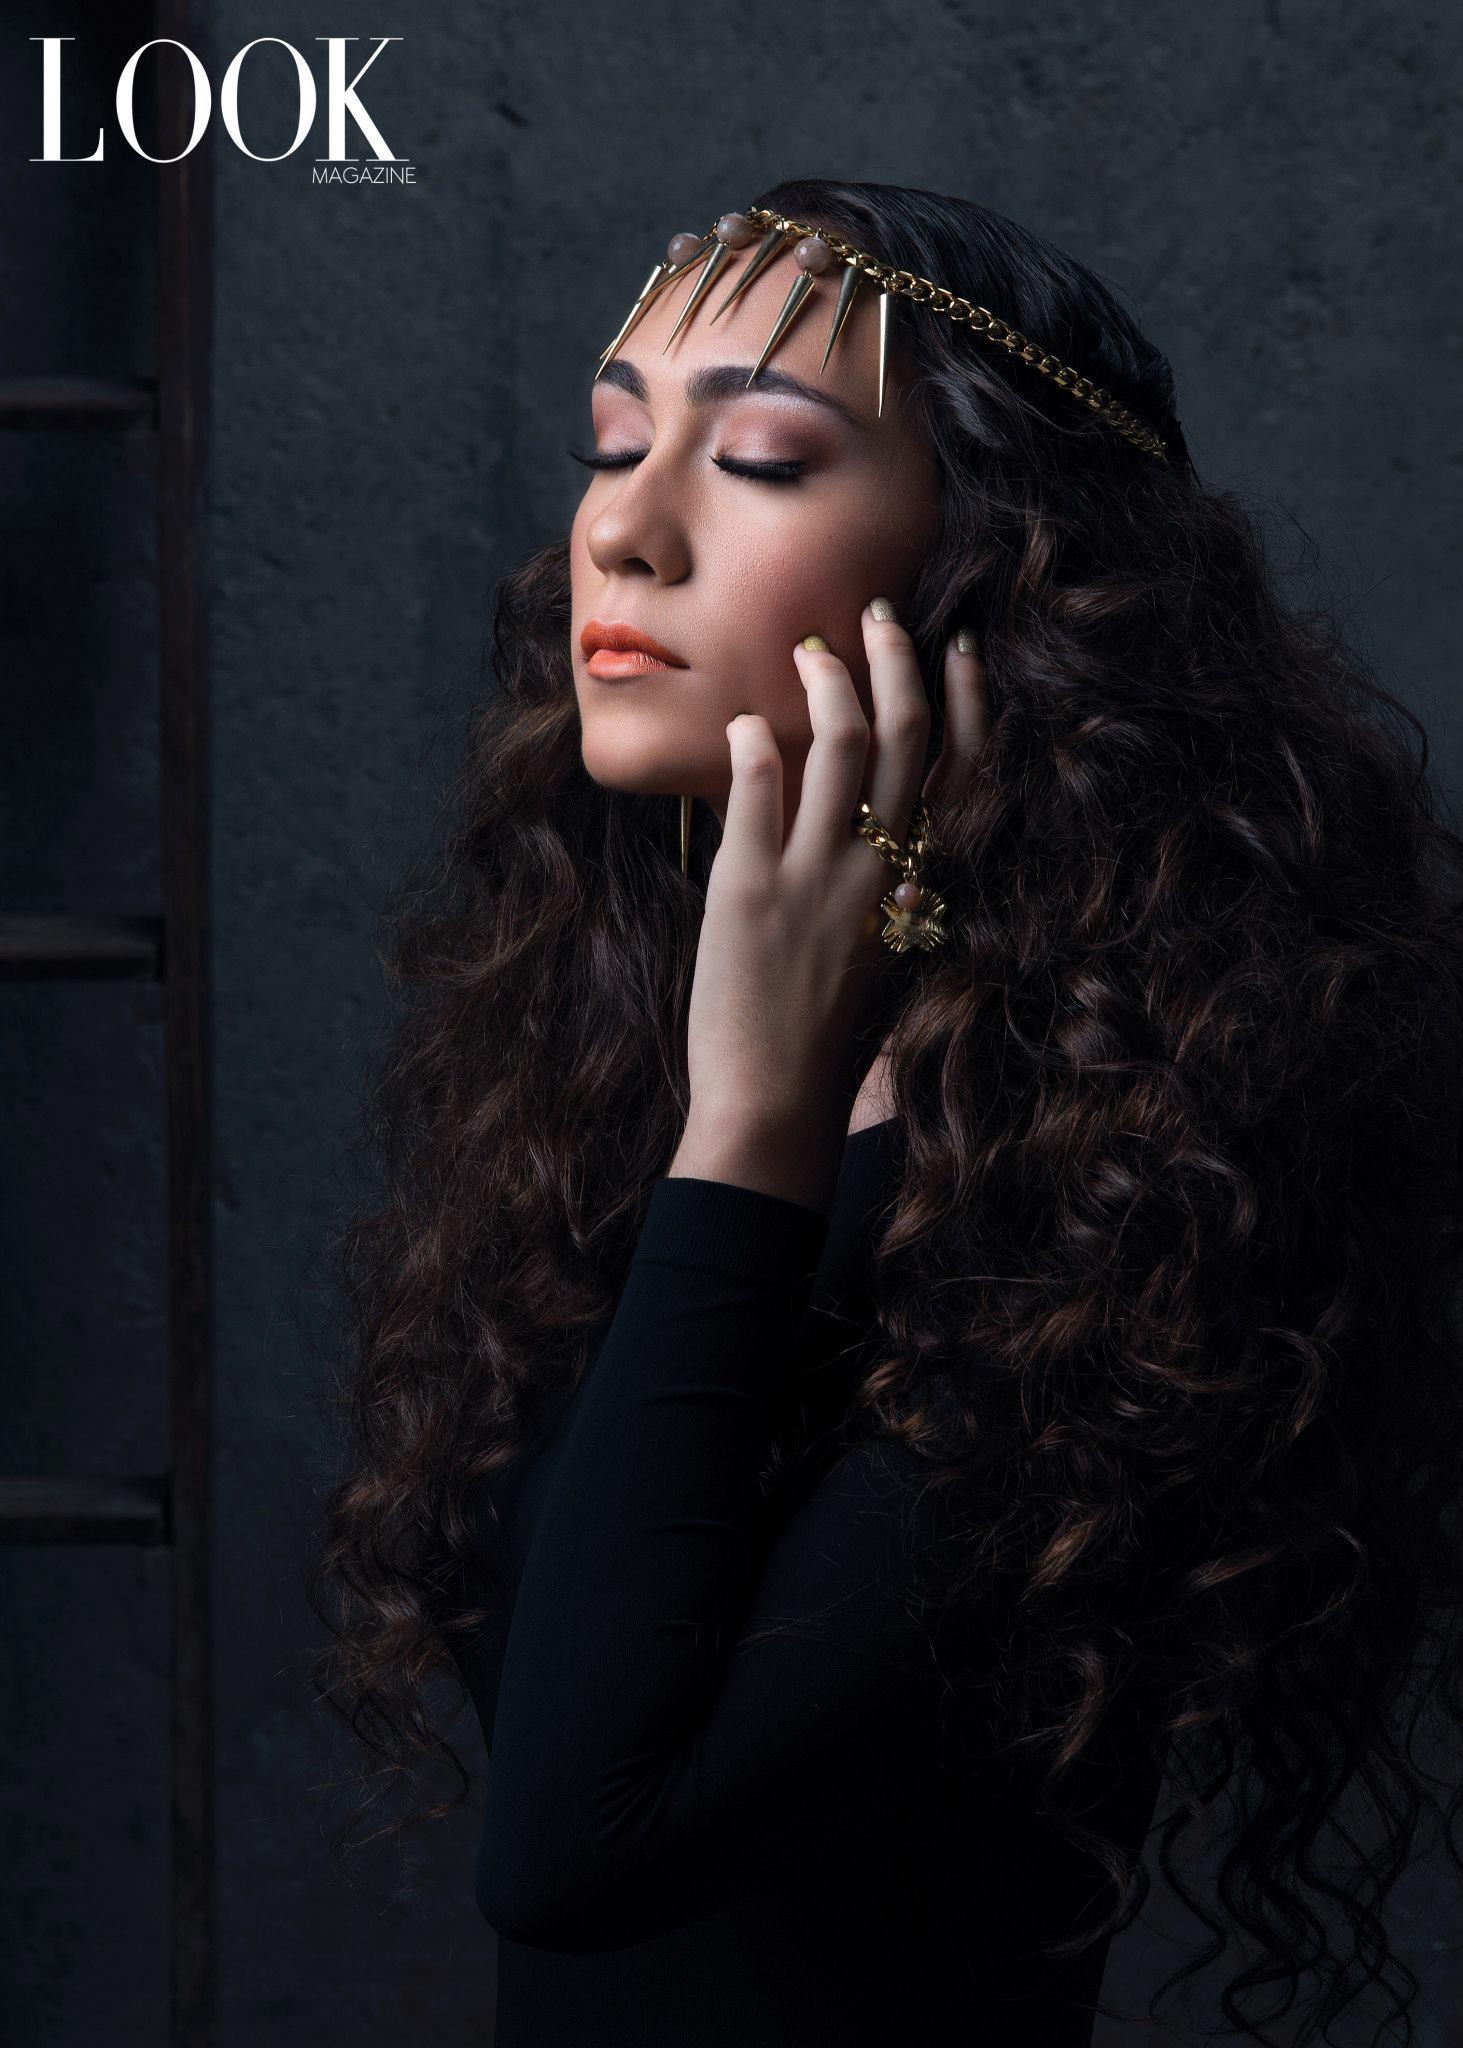 Look Magazine / Photography: Victor Martinez